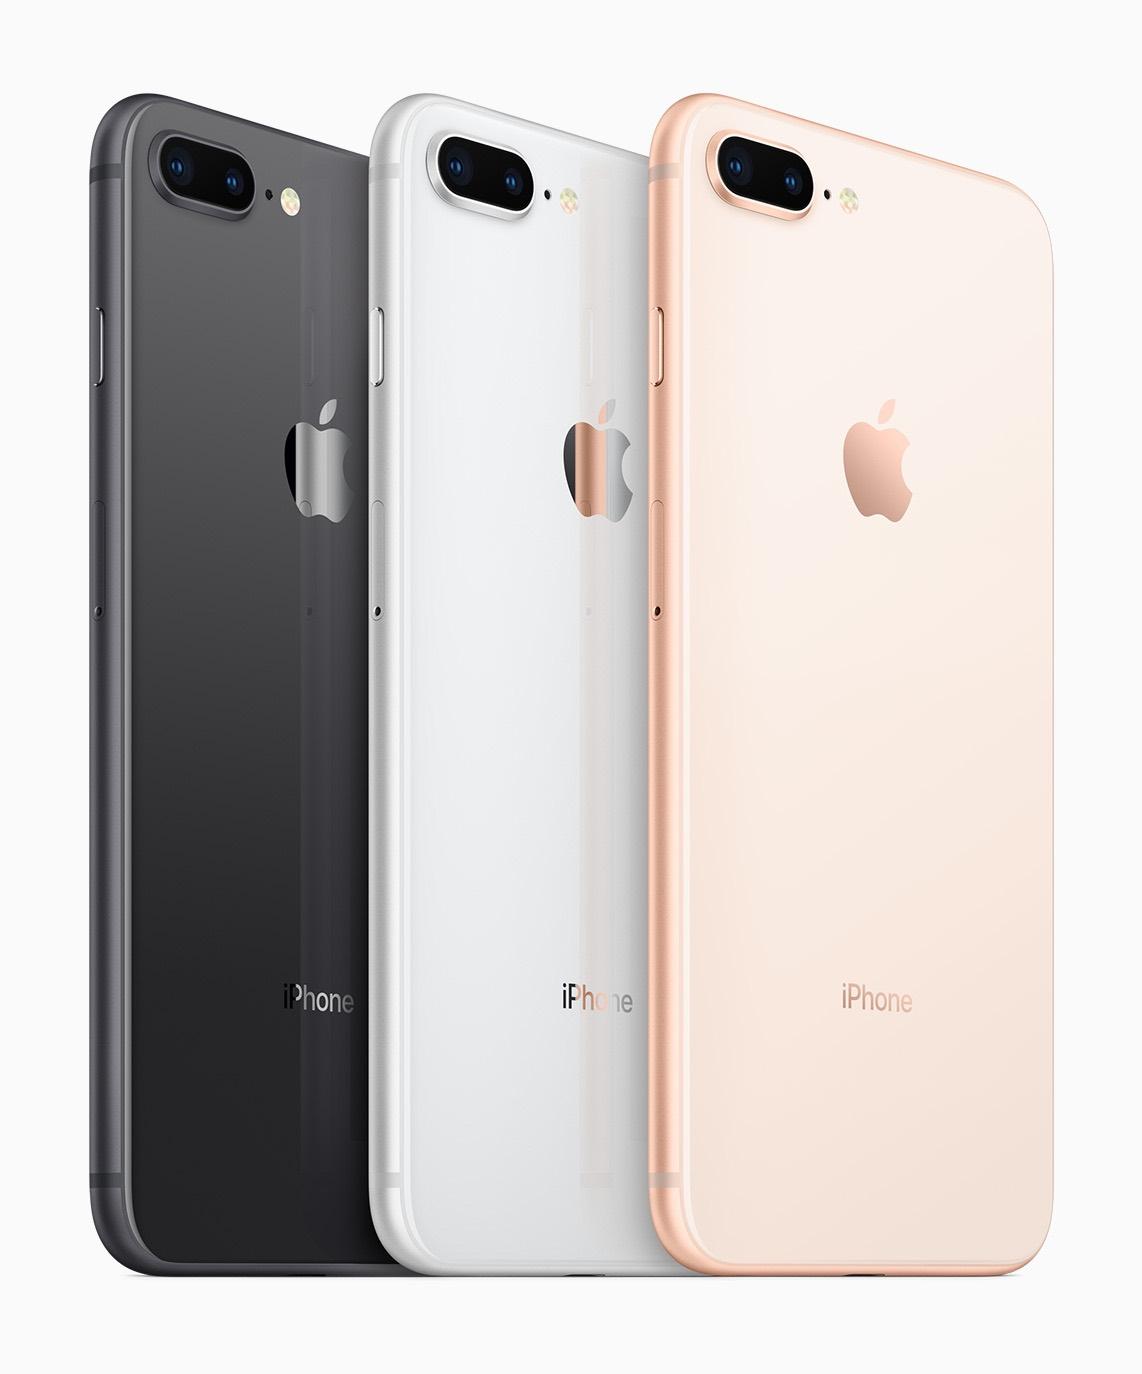 IPhone 8 Plus Leistung Kamera Handler Preise